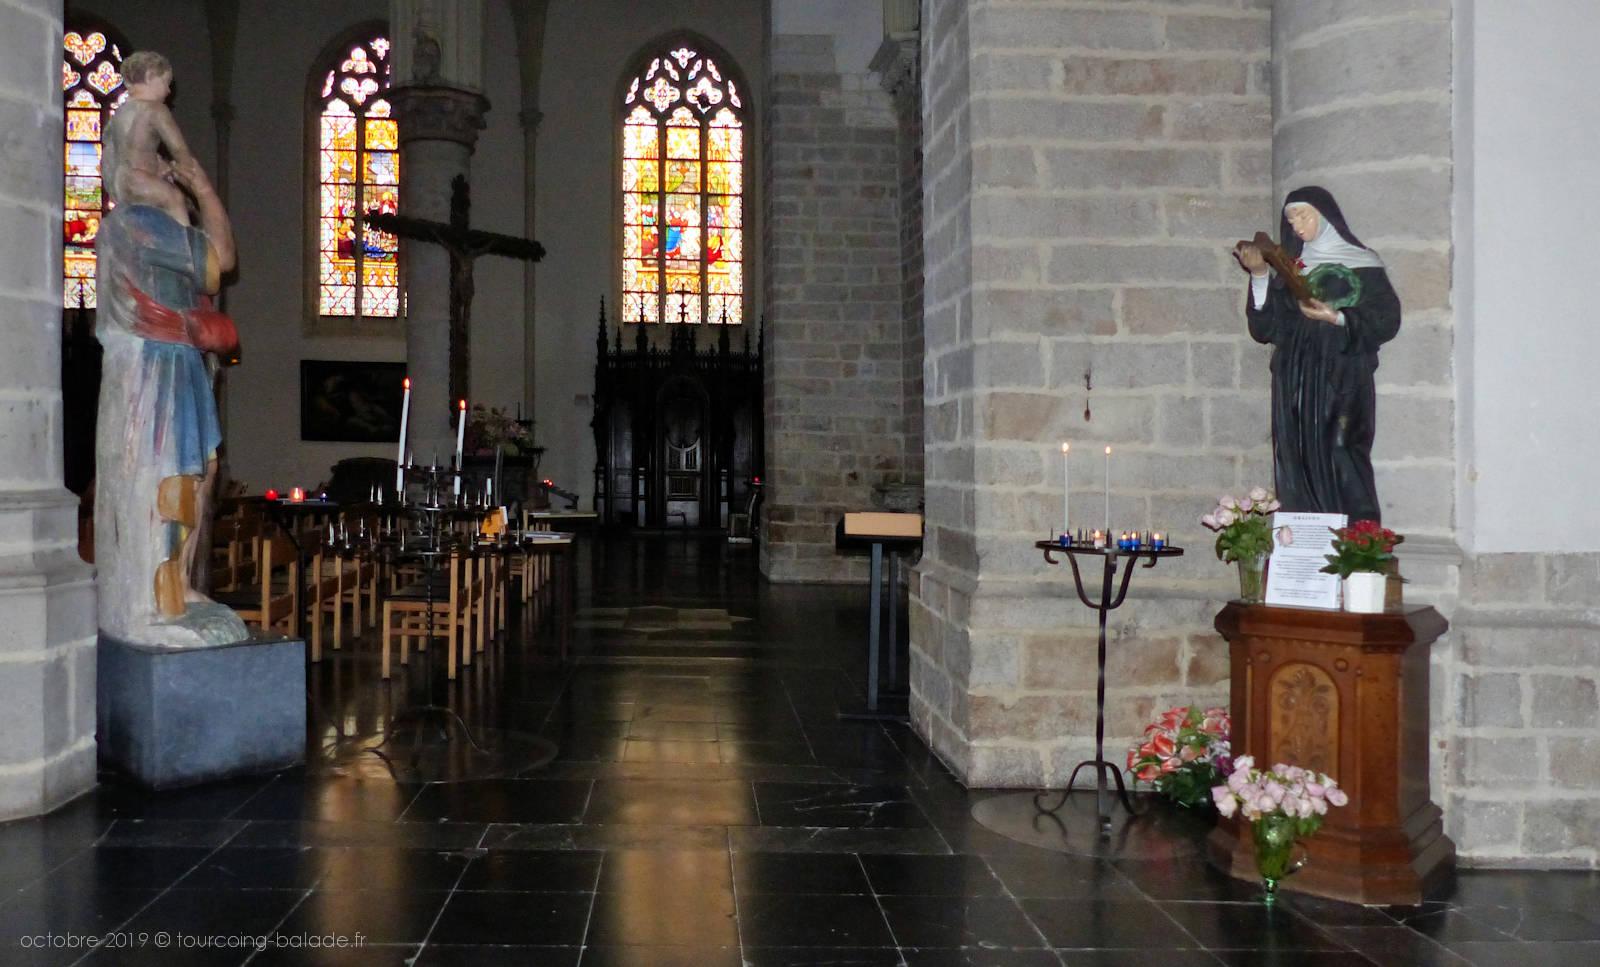 Rita et Christophe, église St Christophe, Tourcoing 2019